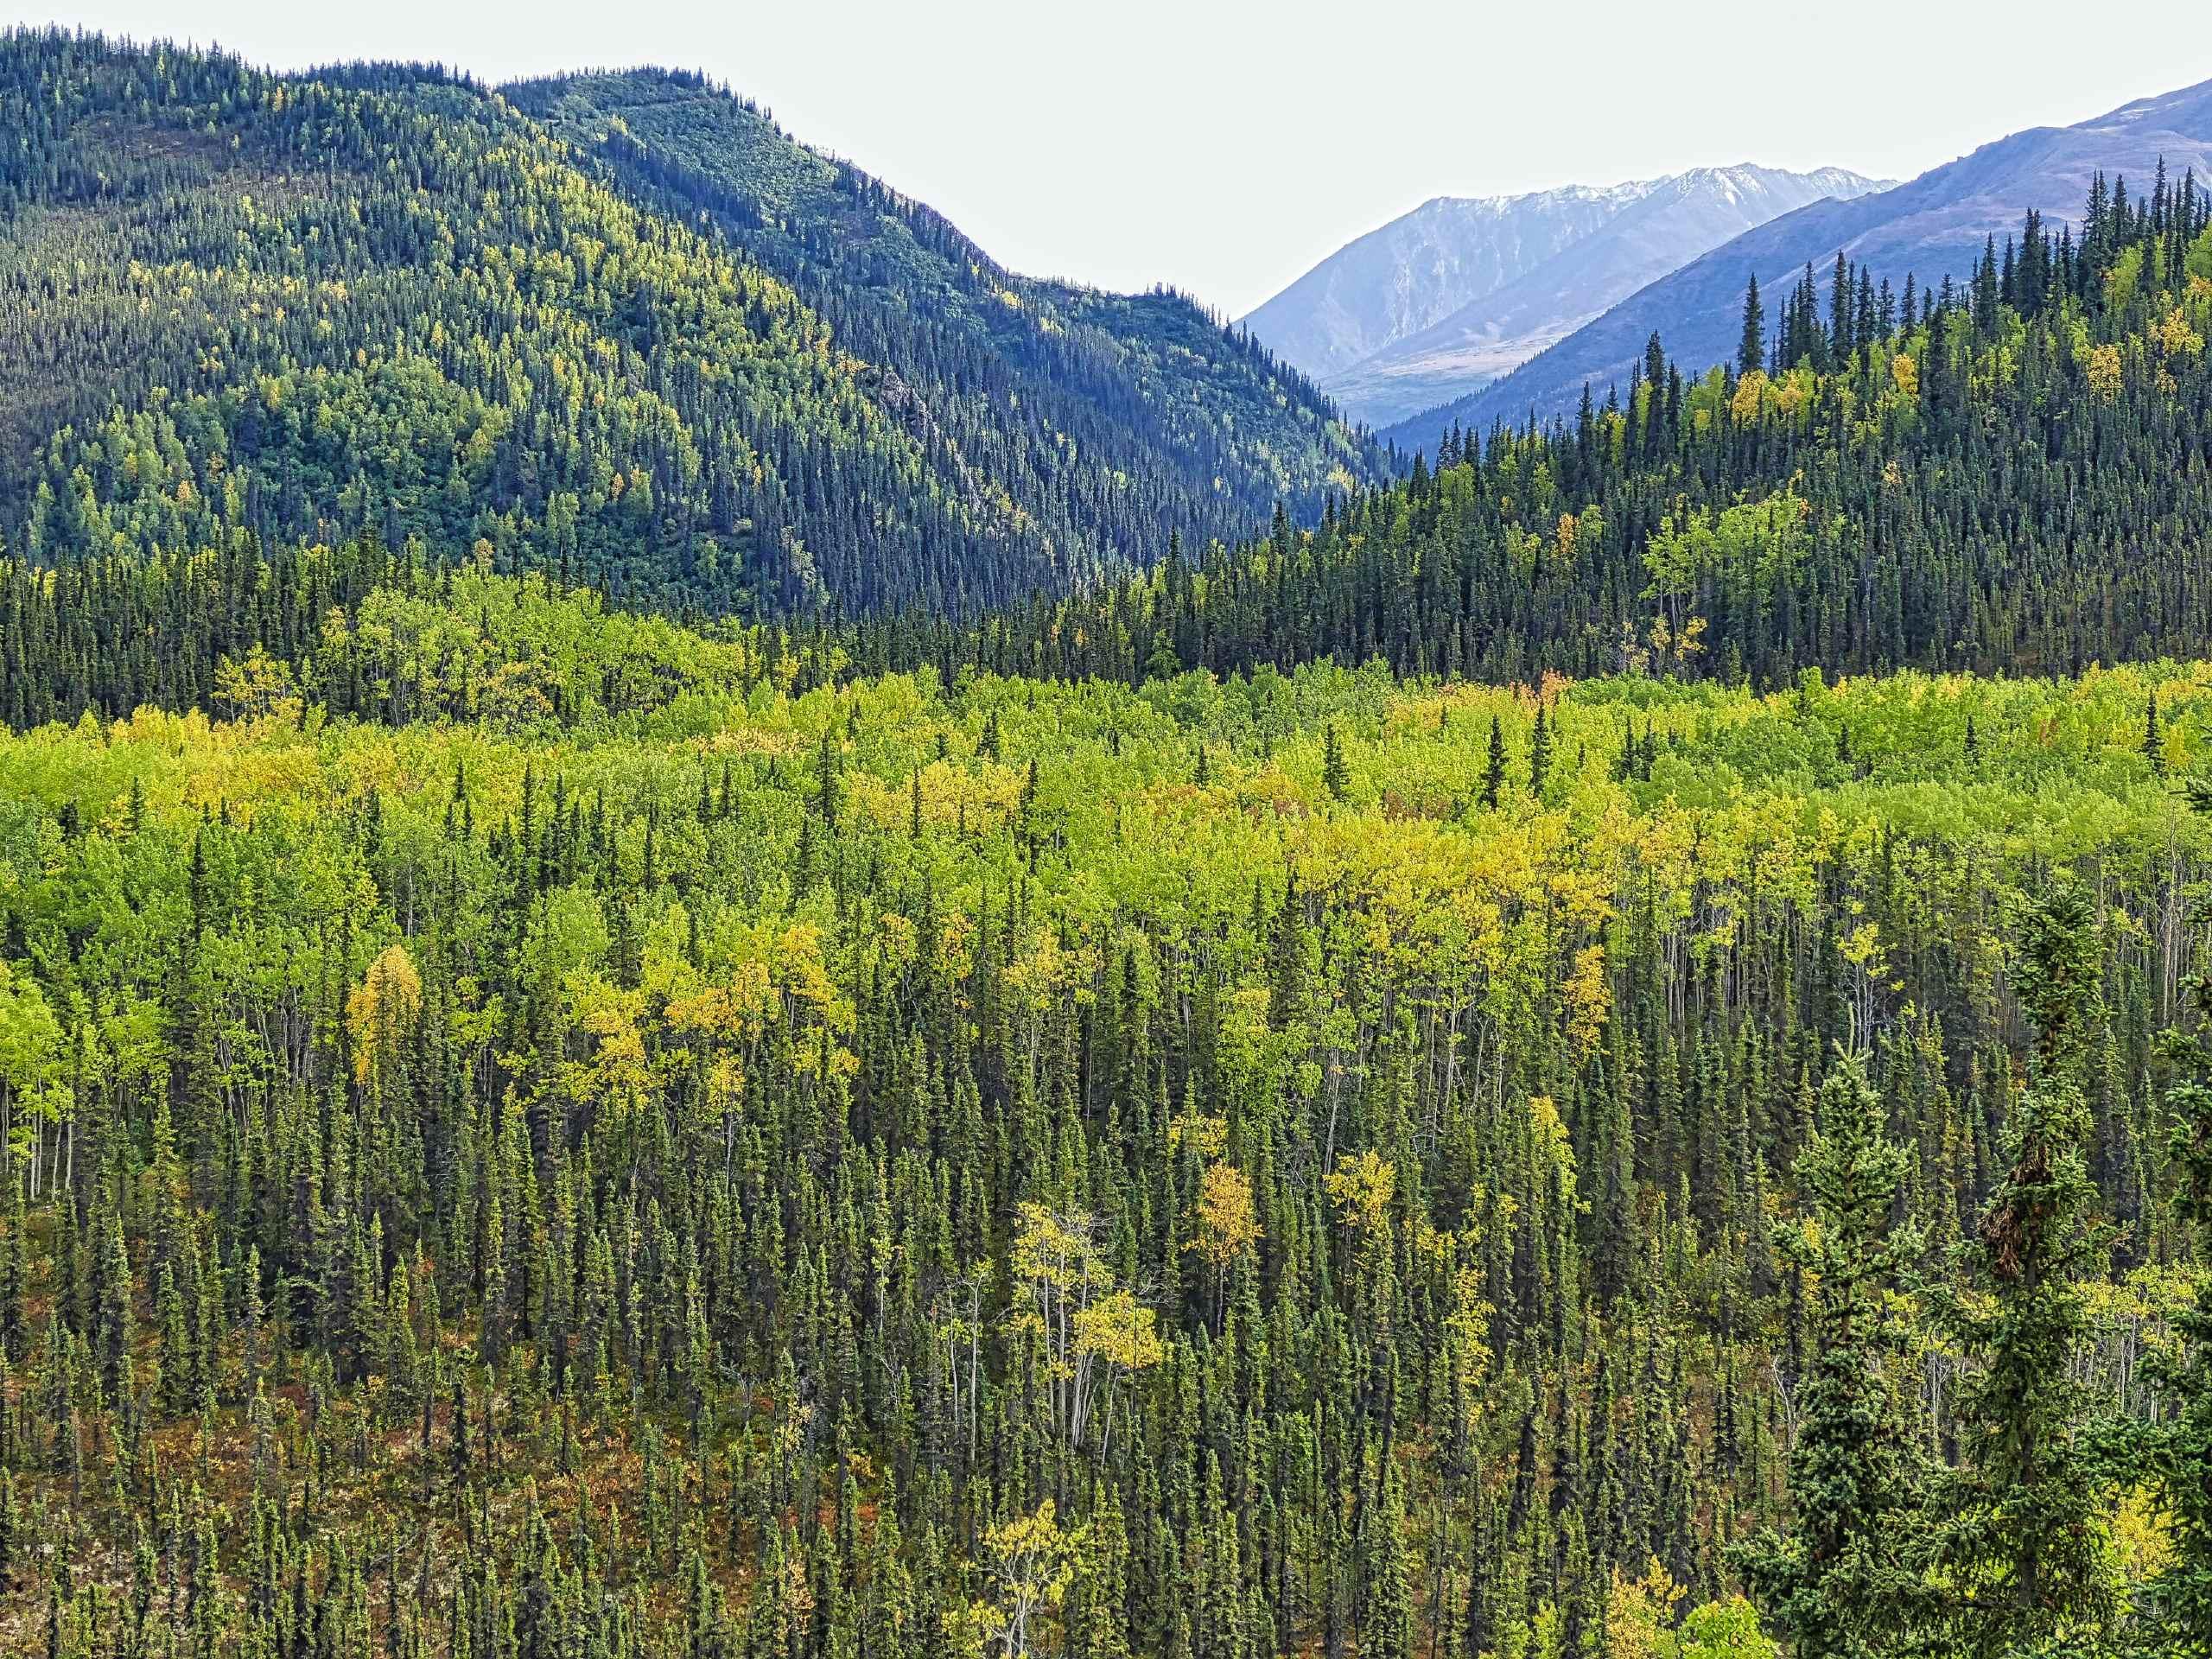 Forests in Alaska